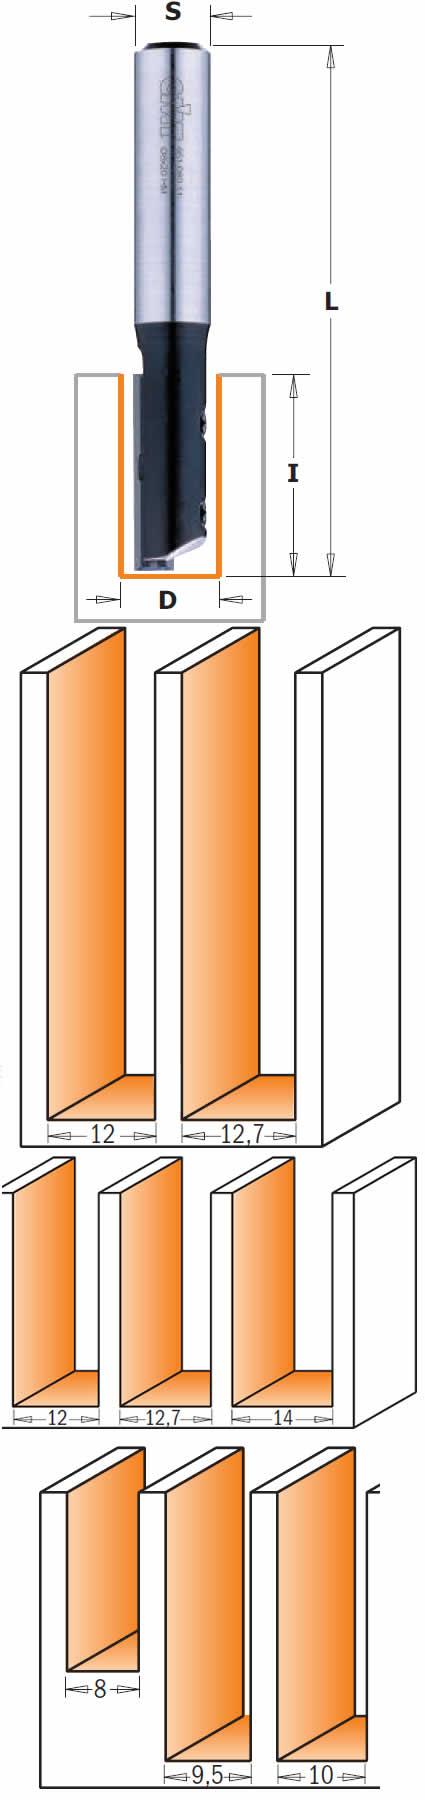 Fresa portacuchillas de un corte recto para ranuras de pequeño diametro, utiliza cuchillas reversibles desechables